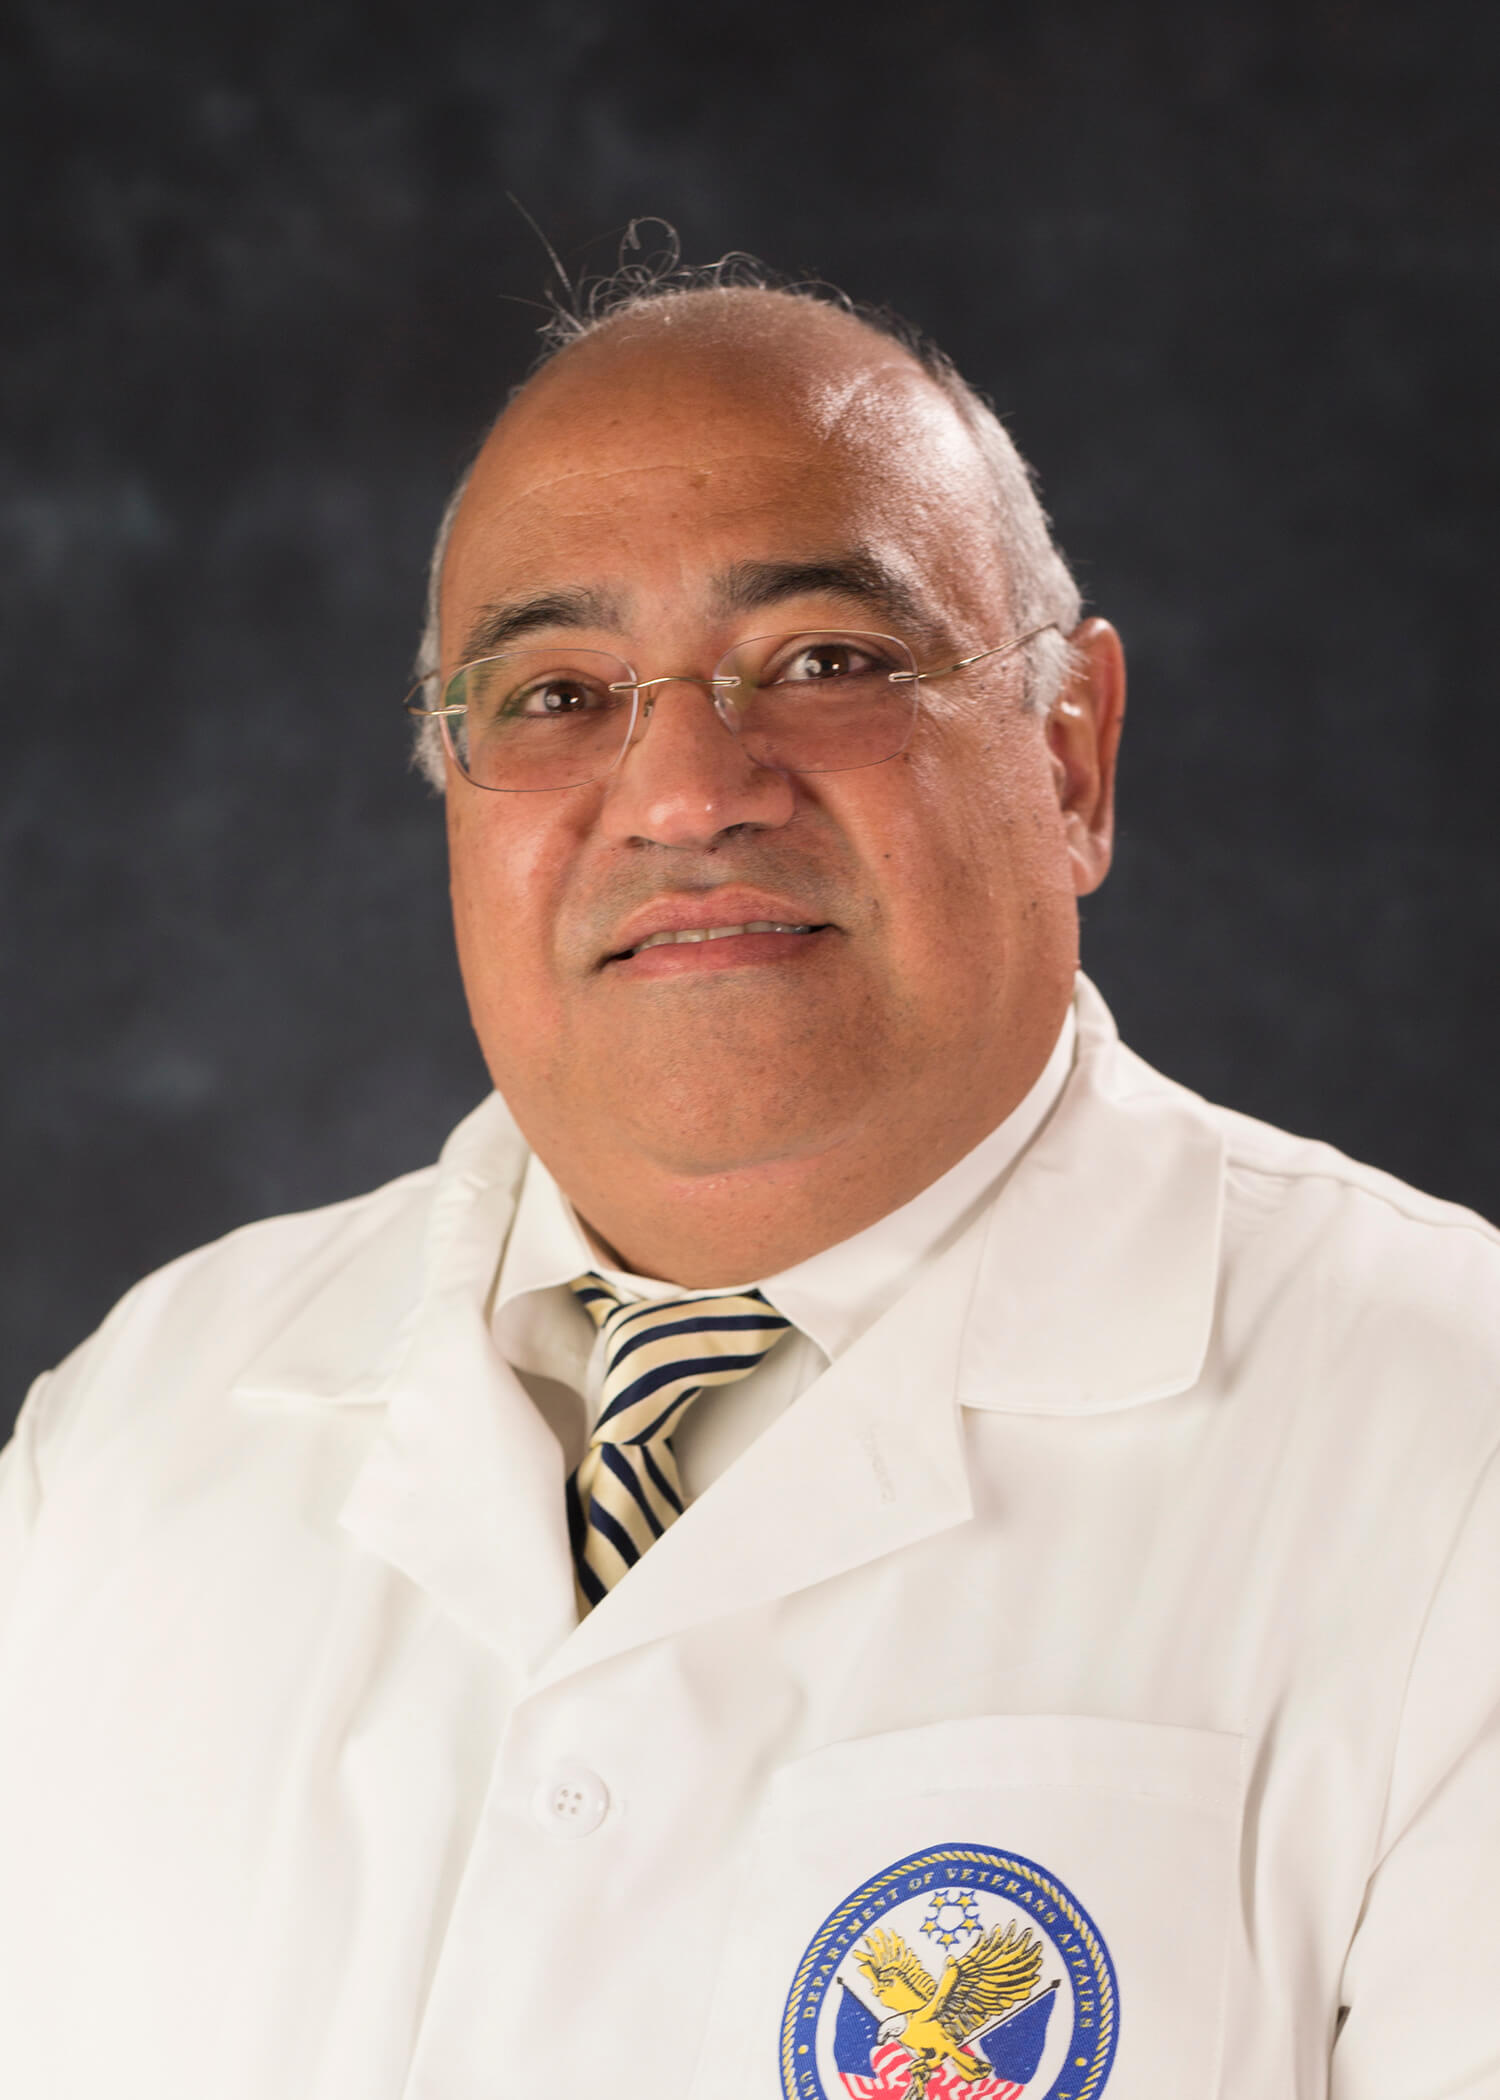 Photo of Wael Shams, M.D.